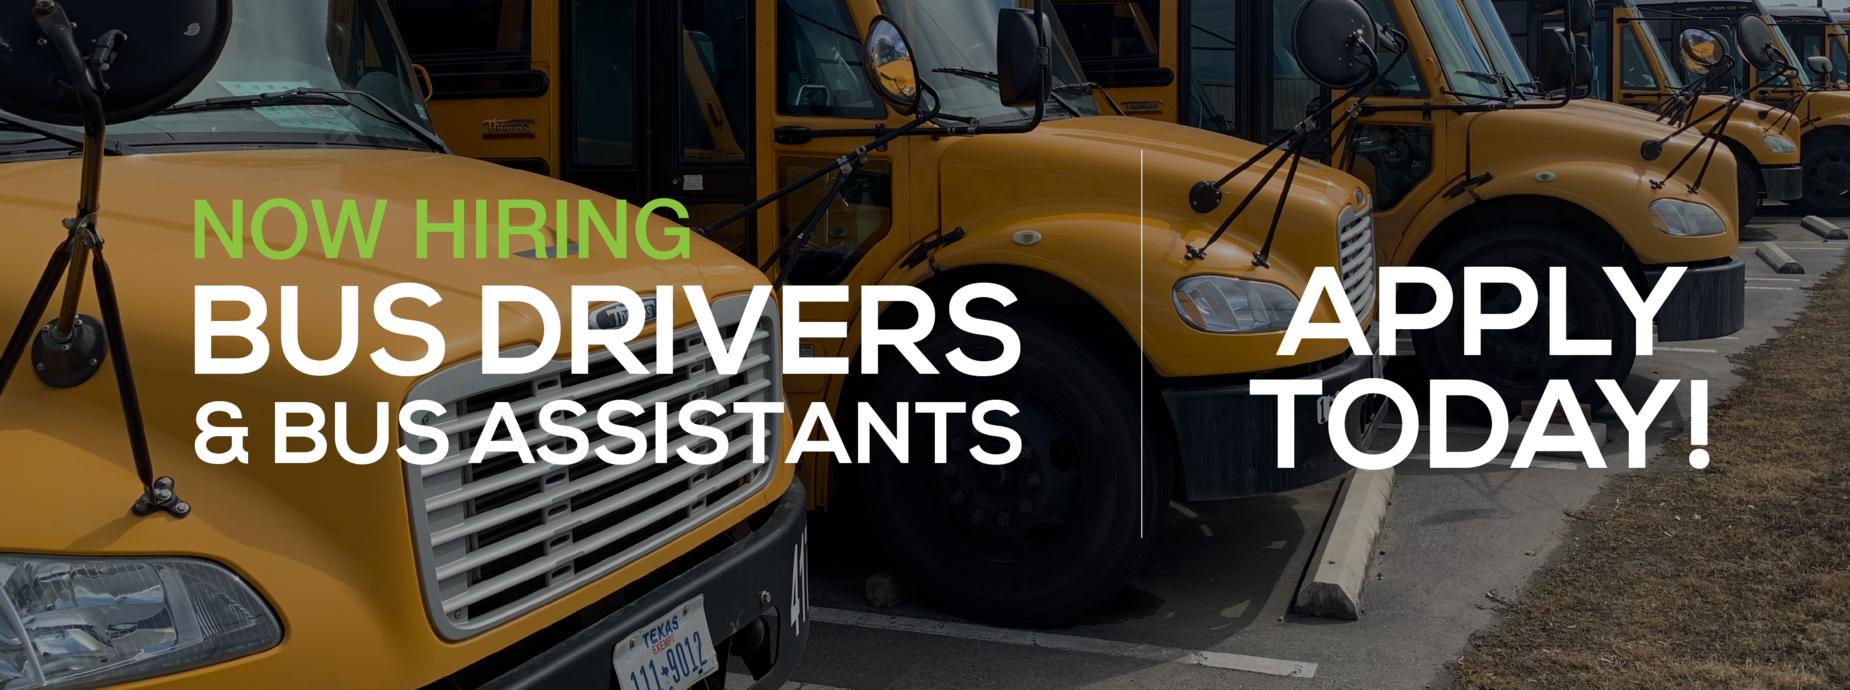 Now Hiring Bus Drivers & Bus Assistants